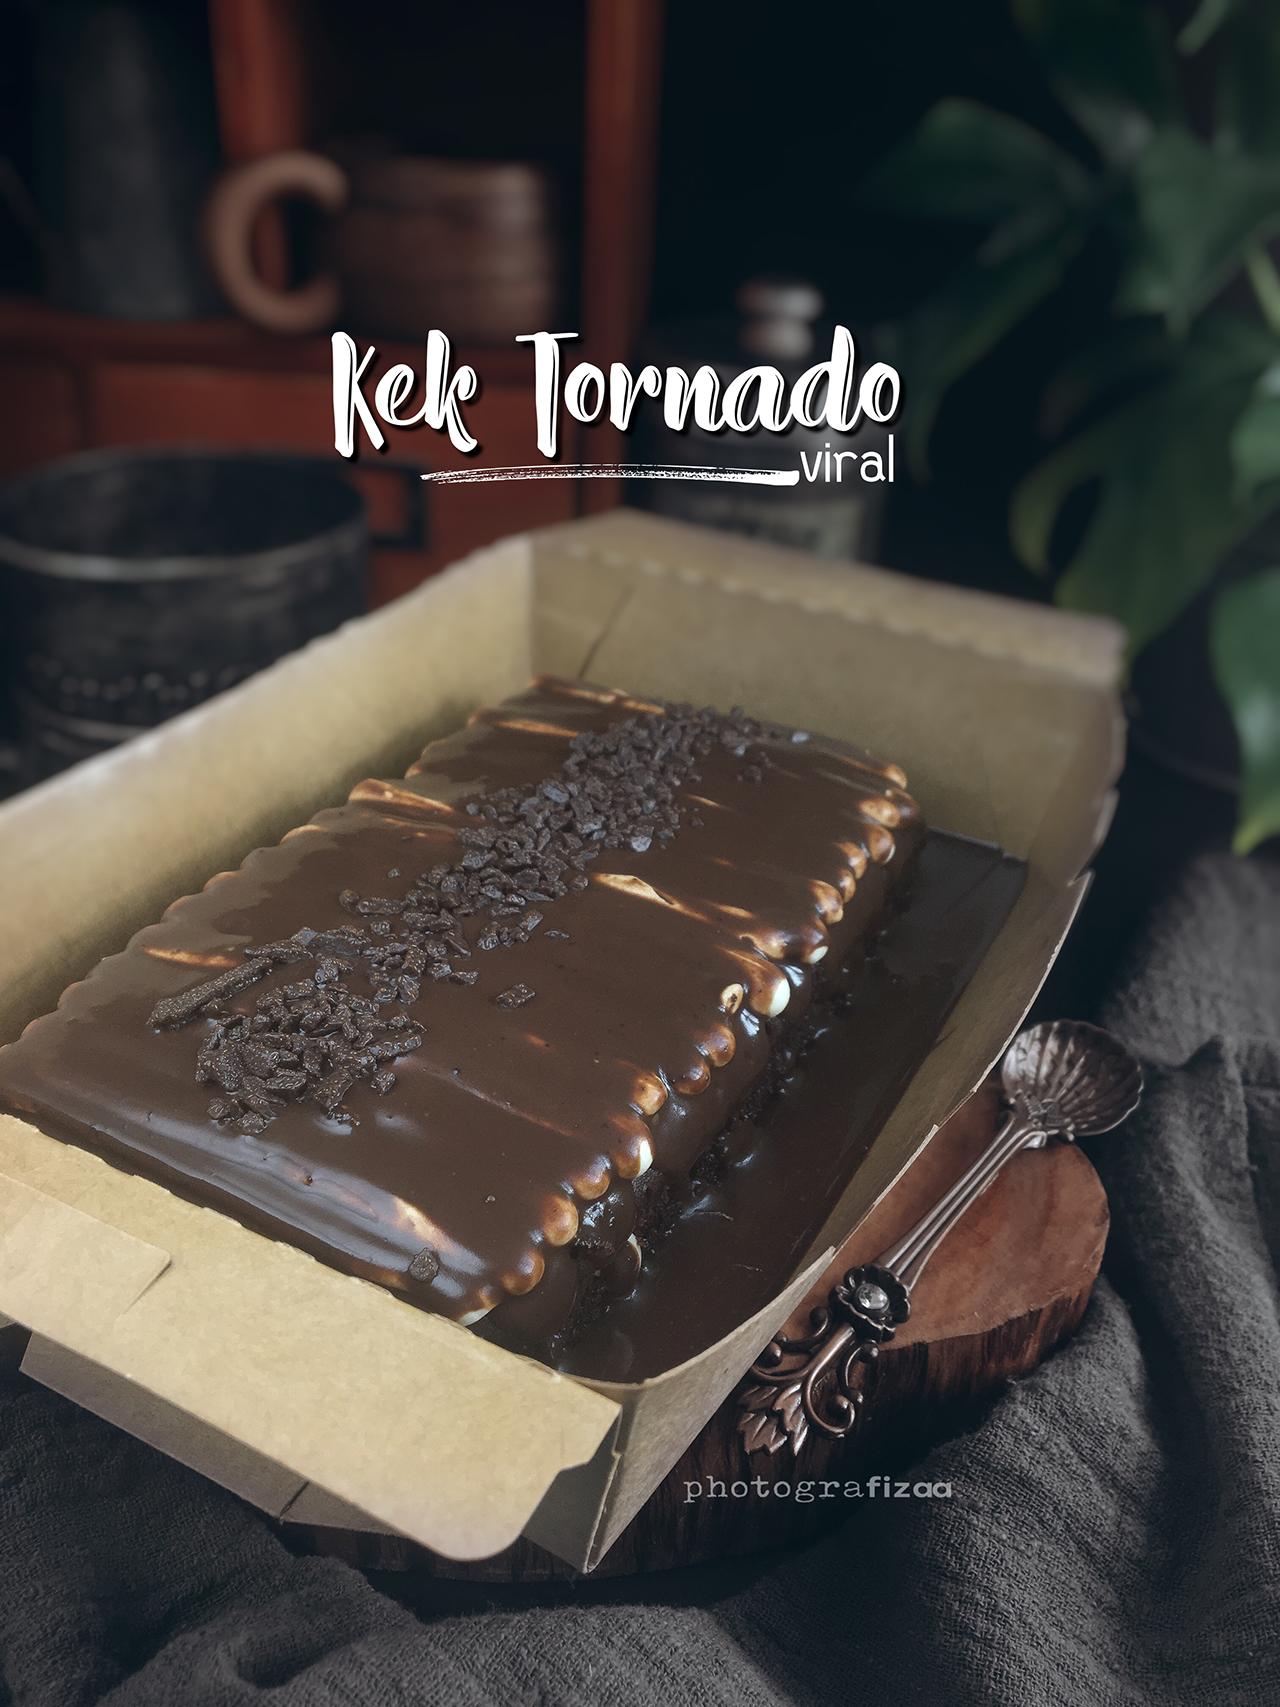 Kek Tornado Coklat Leleh Viral